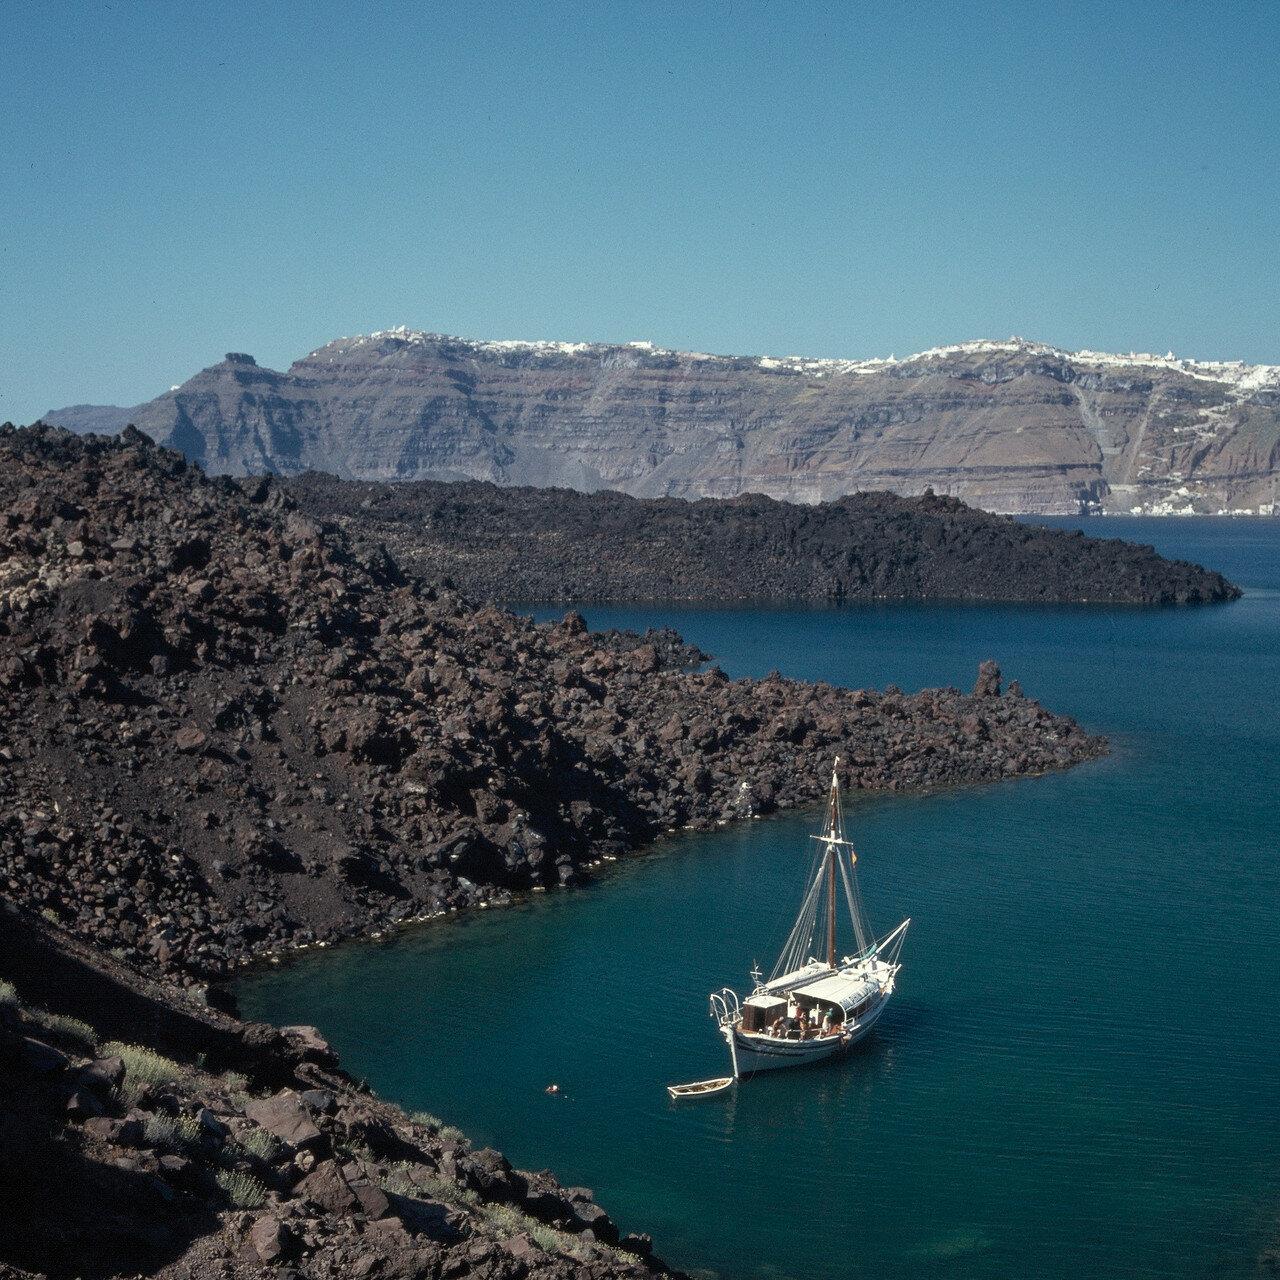 1971. Санторин. Острова Тирасия, Палеа-Камени, Неа-Камени. Лавовые потоки оставшиеся от извержения 1925.